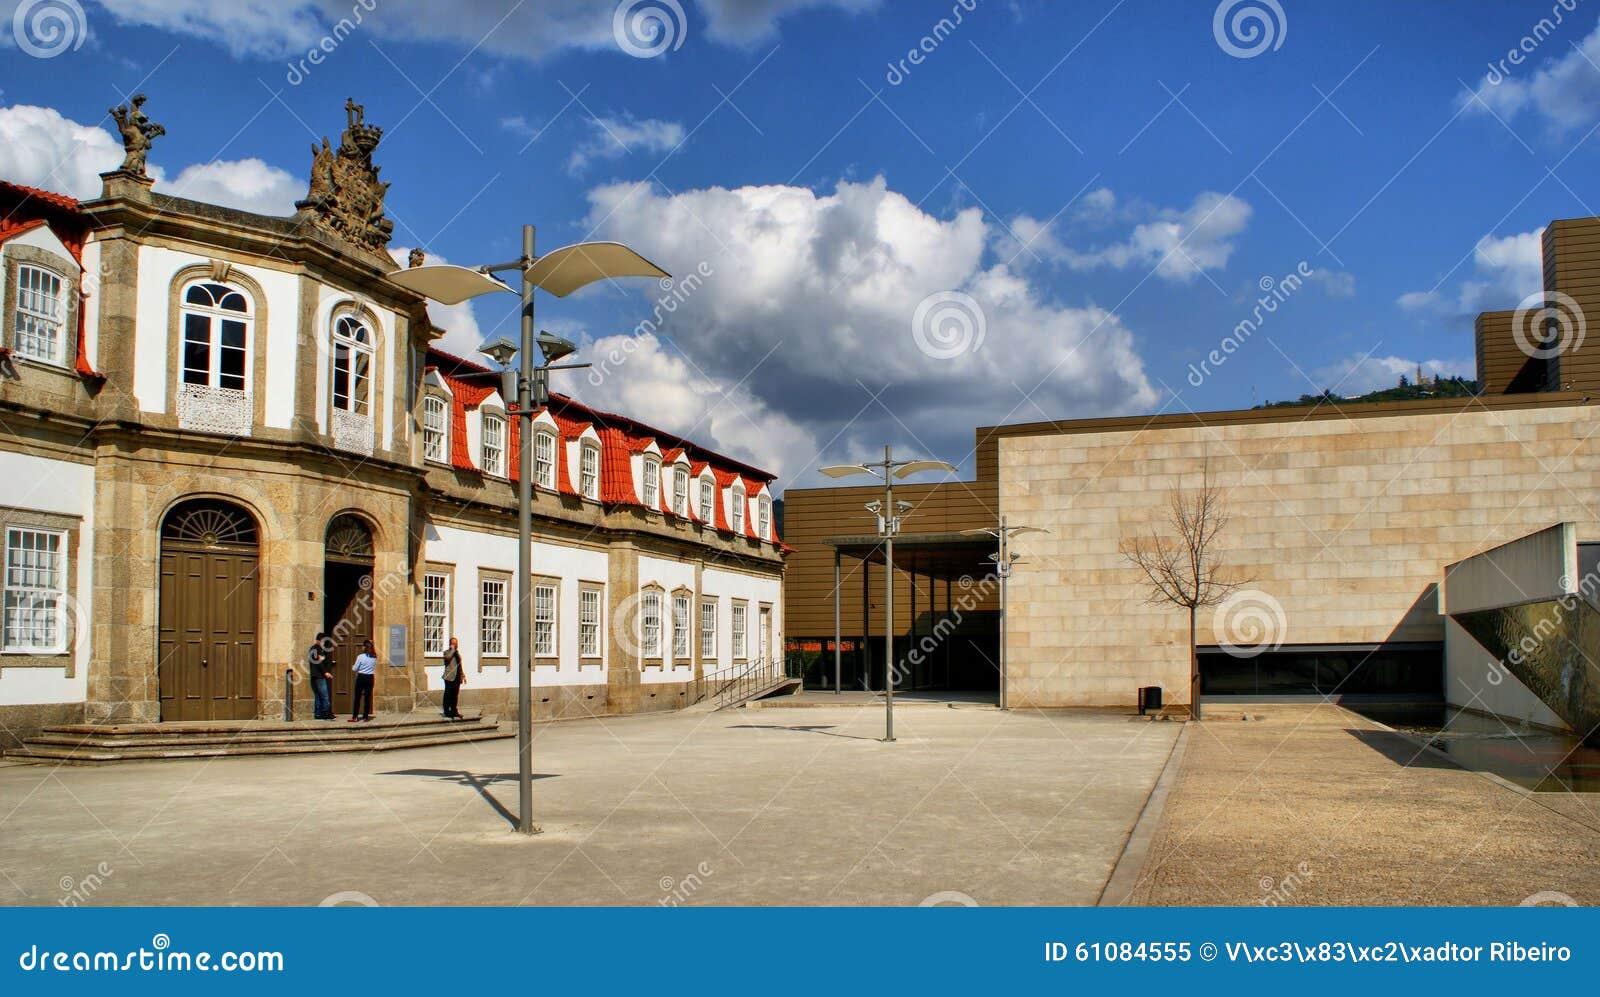 Vilaflor cultural centre in Guimaraes